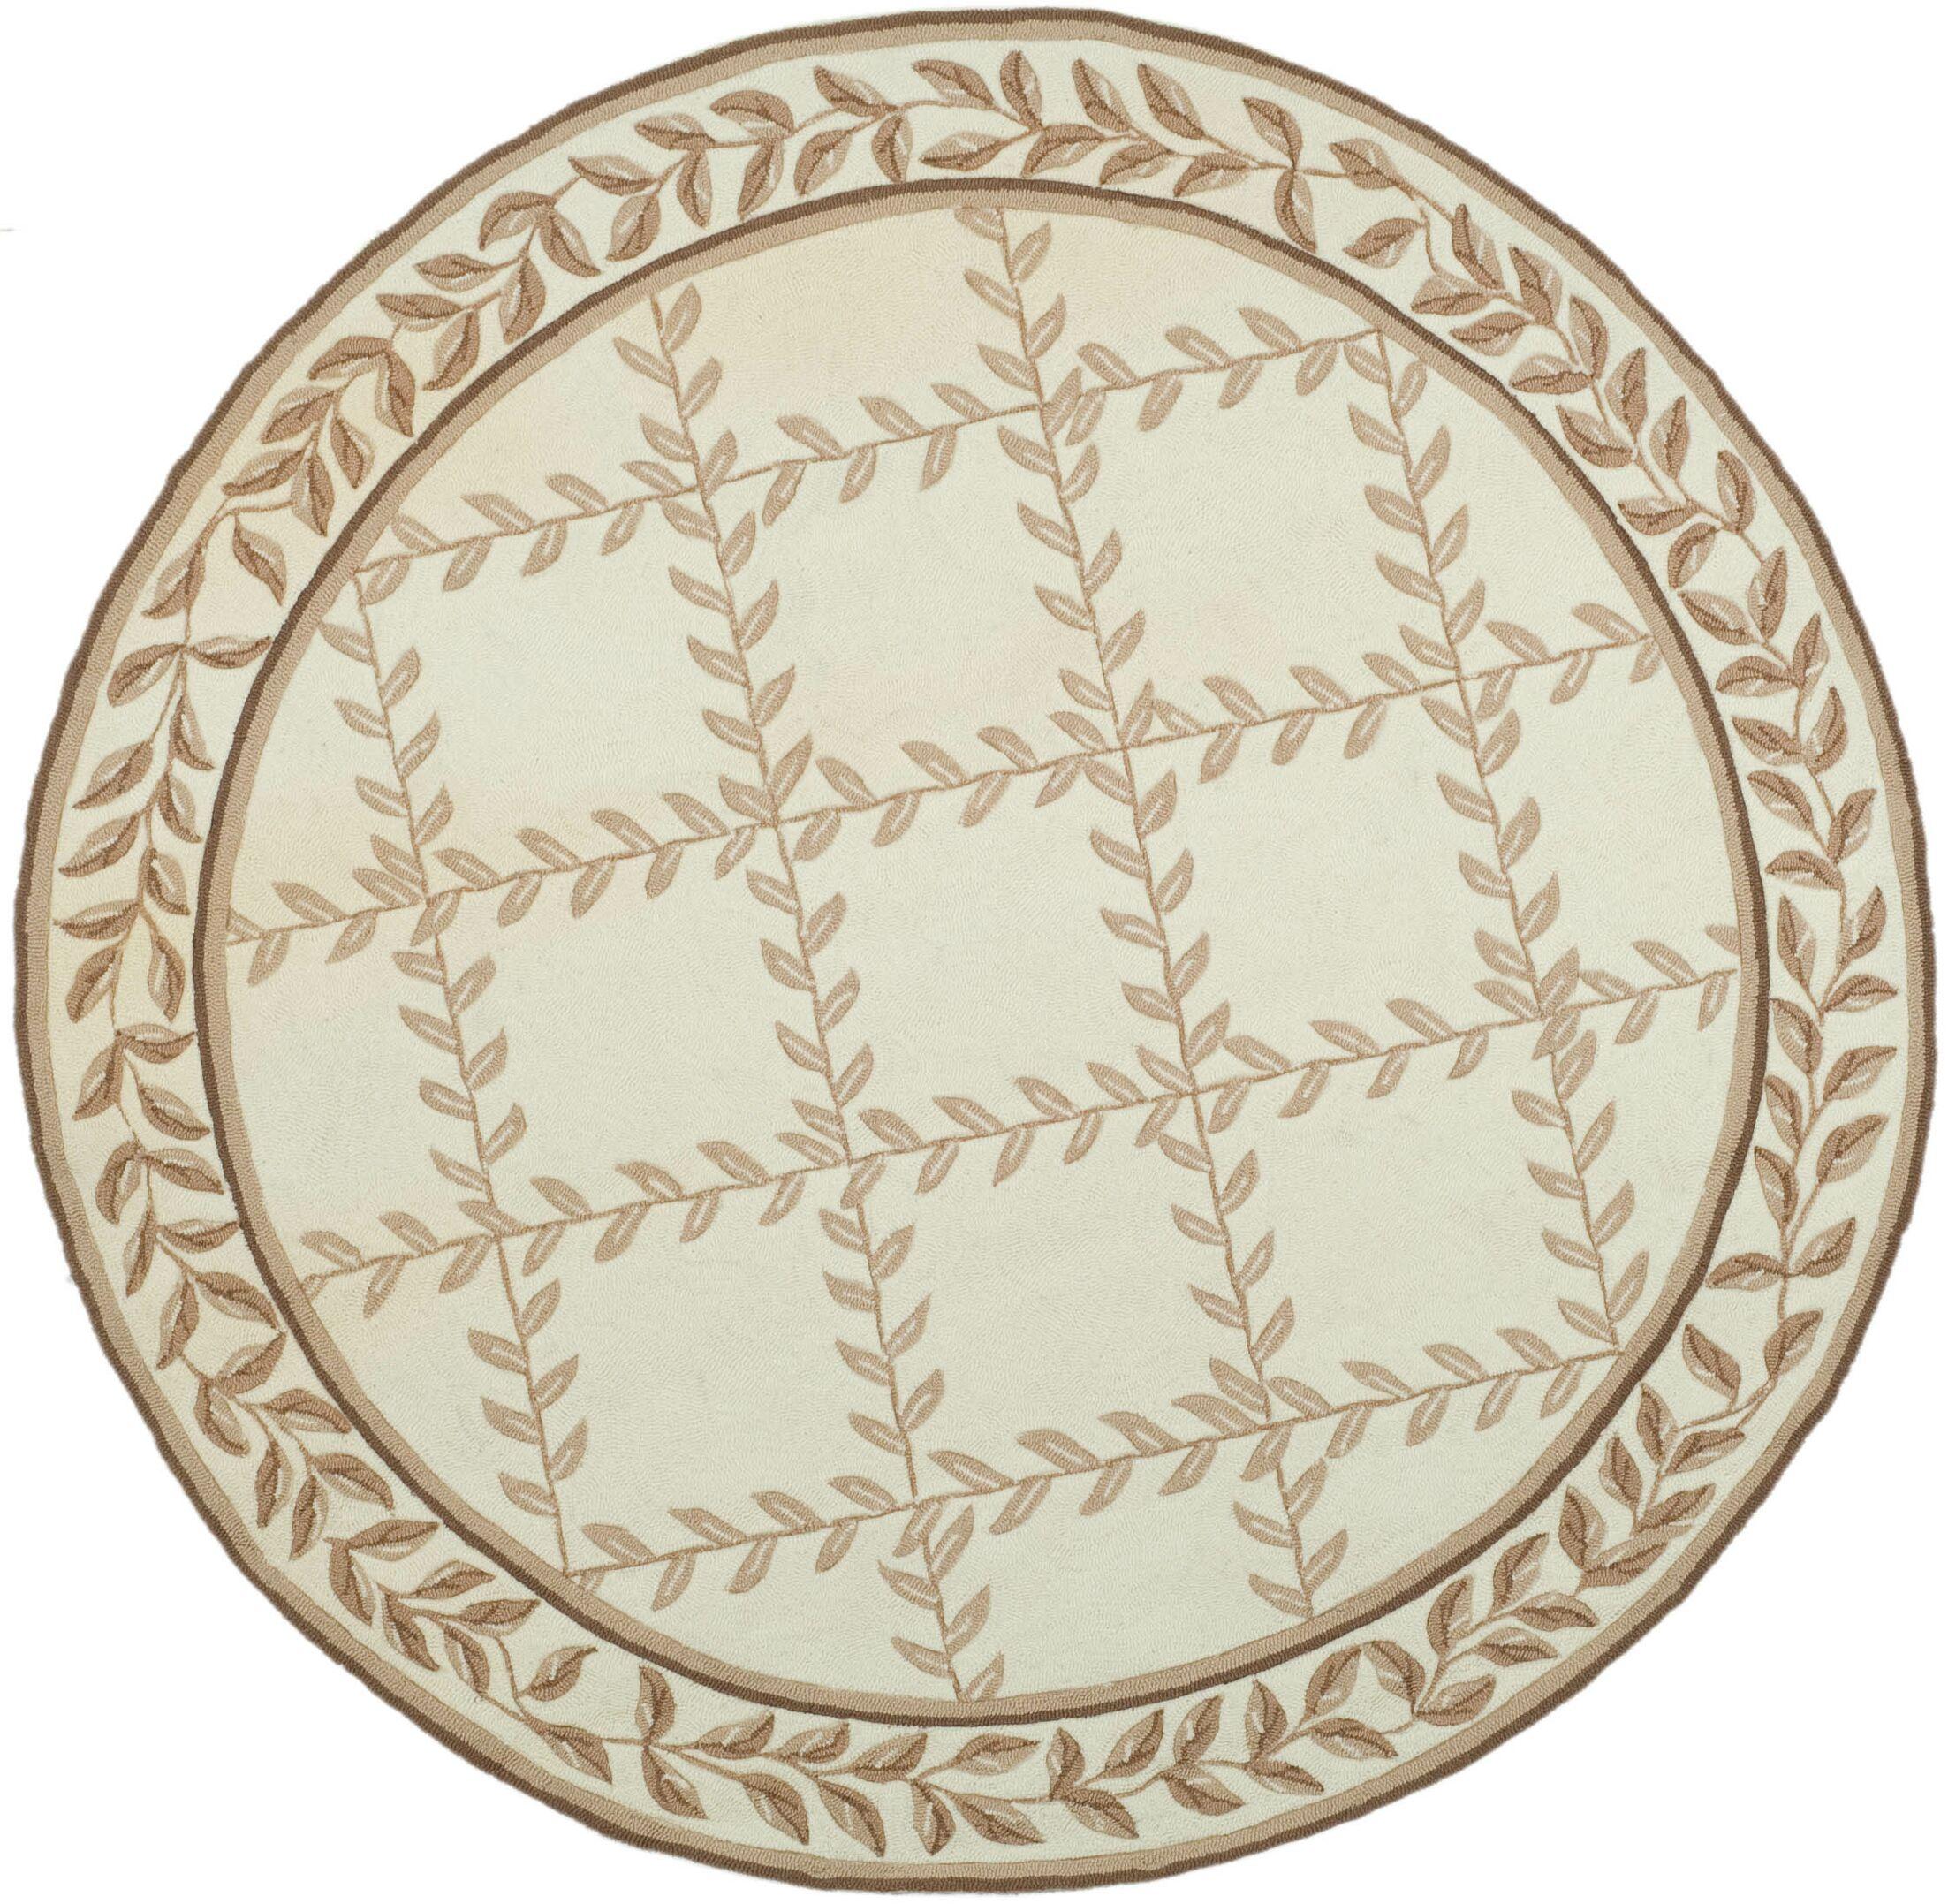 DuraRug Hand-Woven Ivory/Beige Area Rug Rug Size: Round 6'